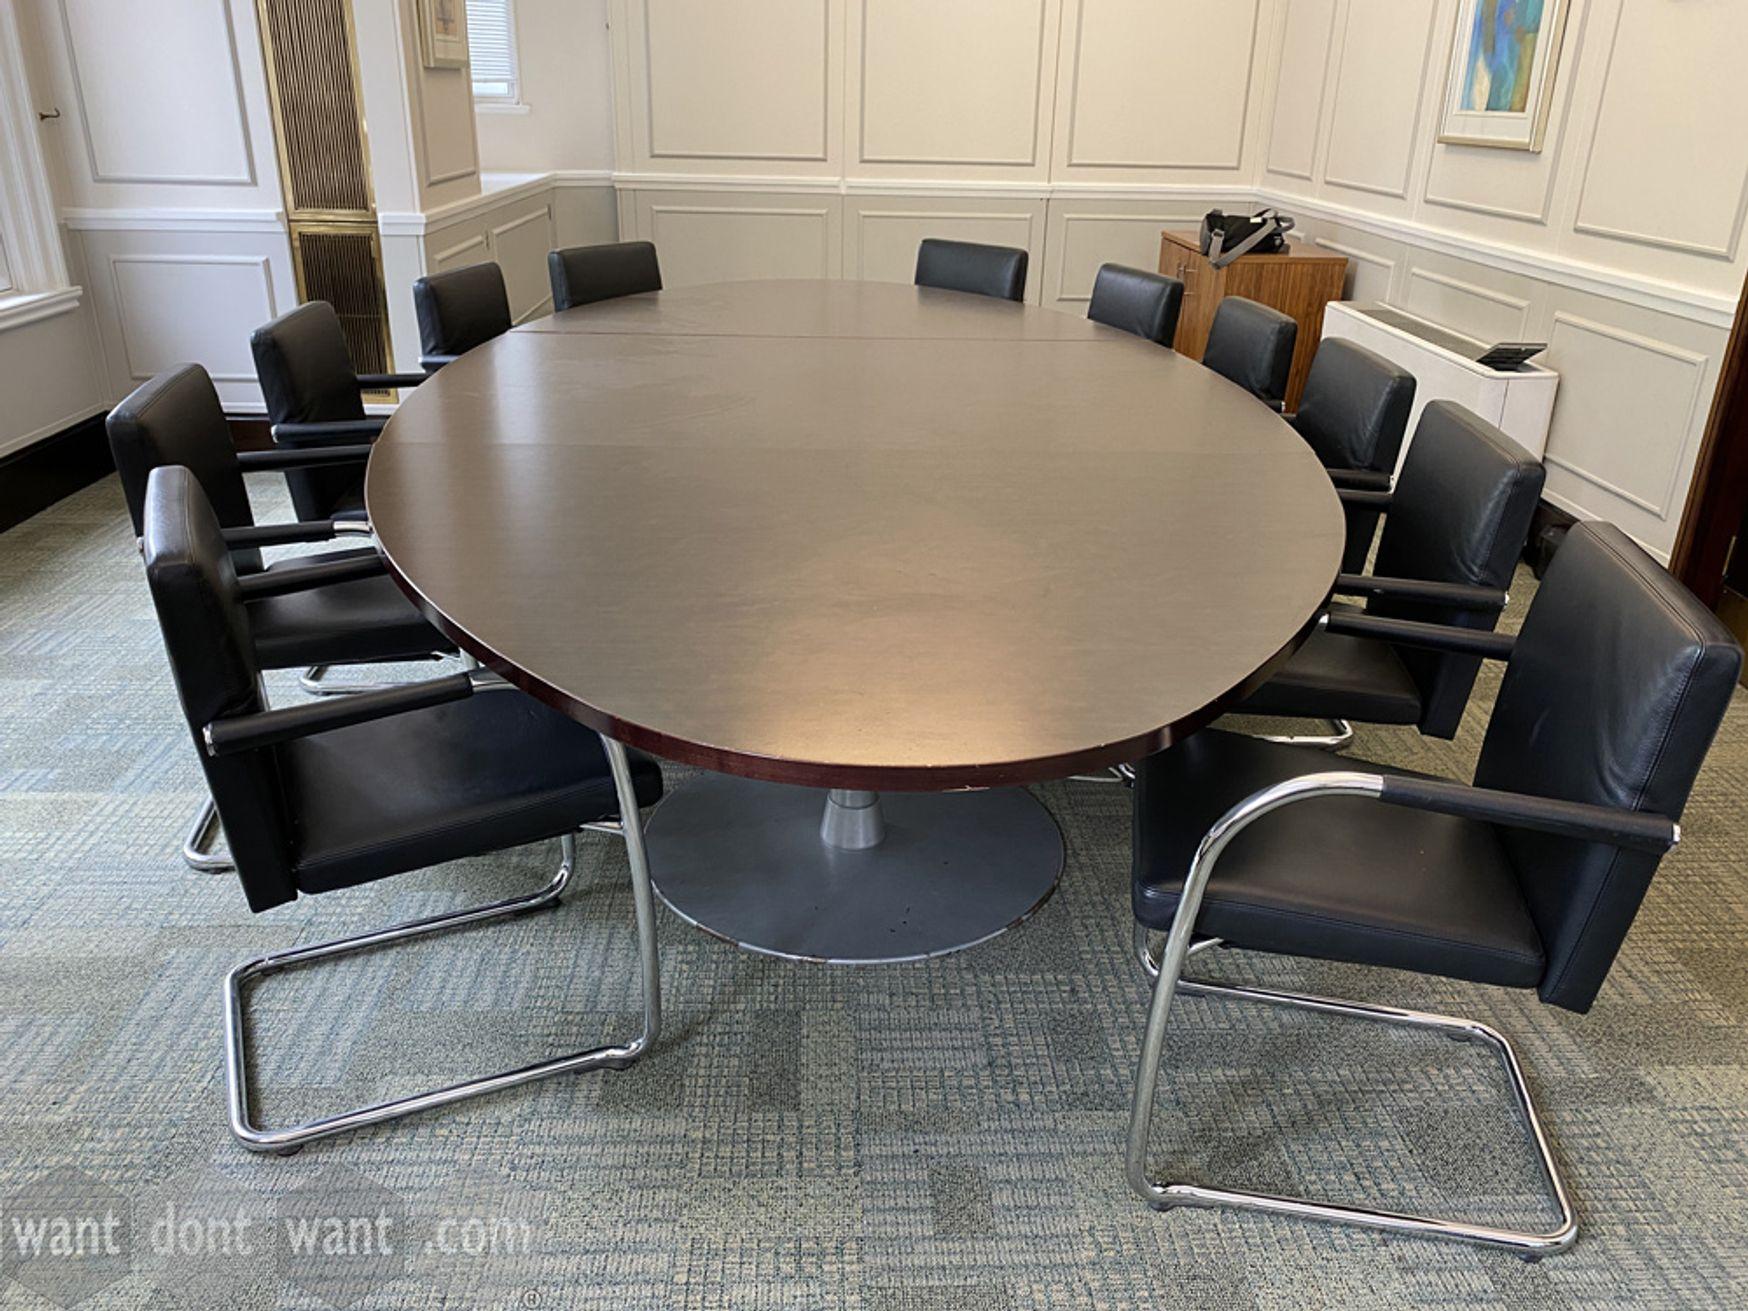 Used 3600mm dark mahogany oval boardroom table to seat 14 people.